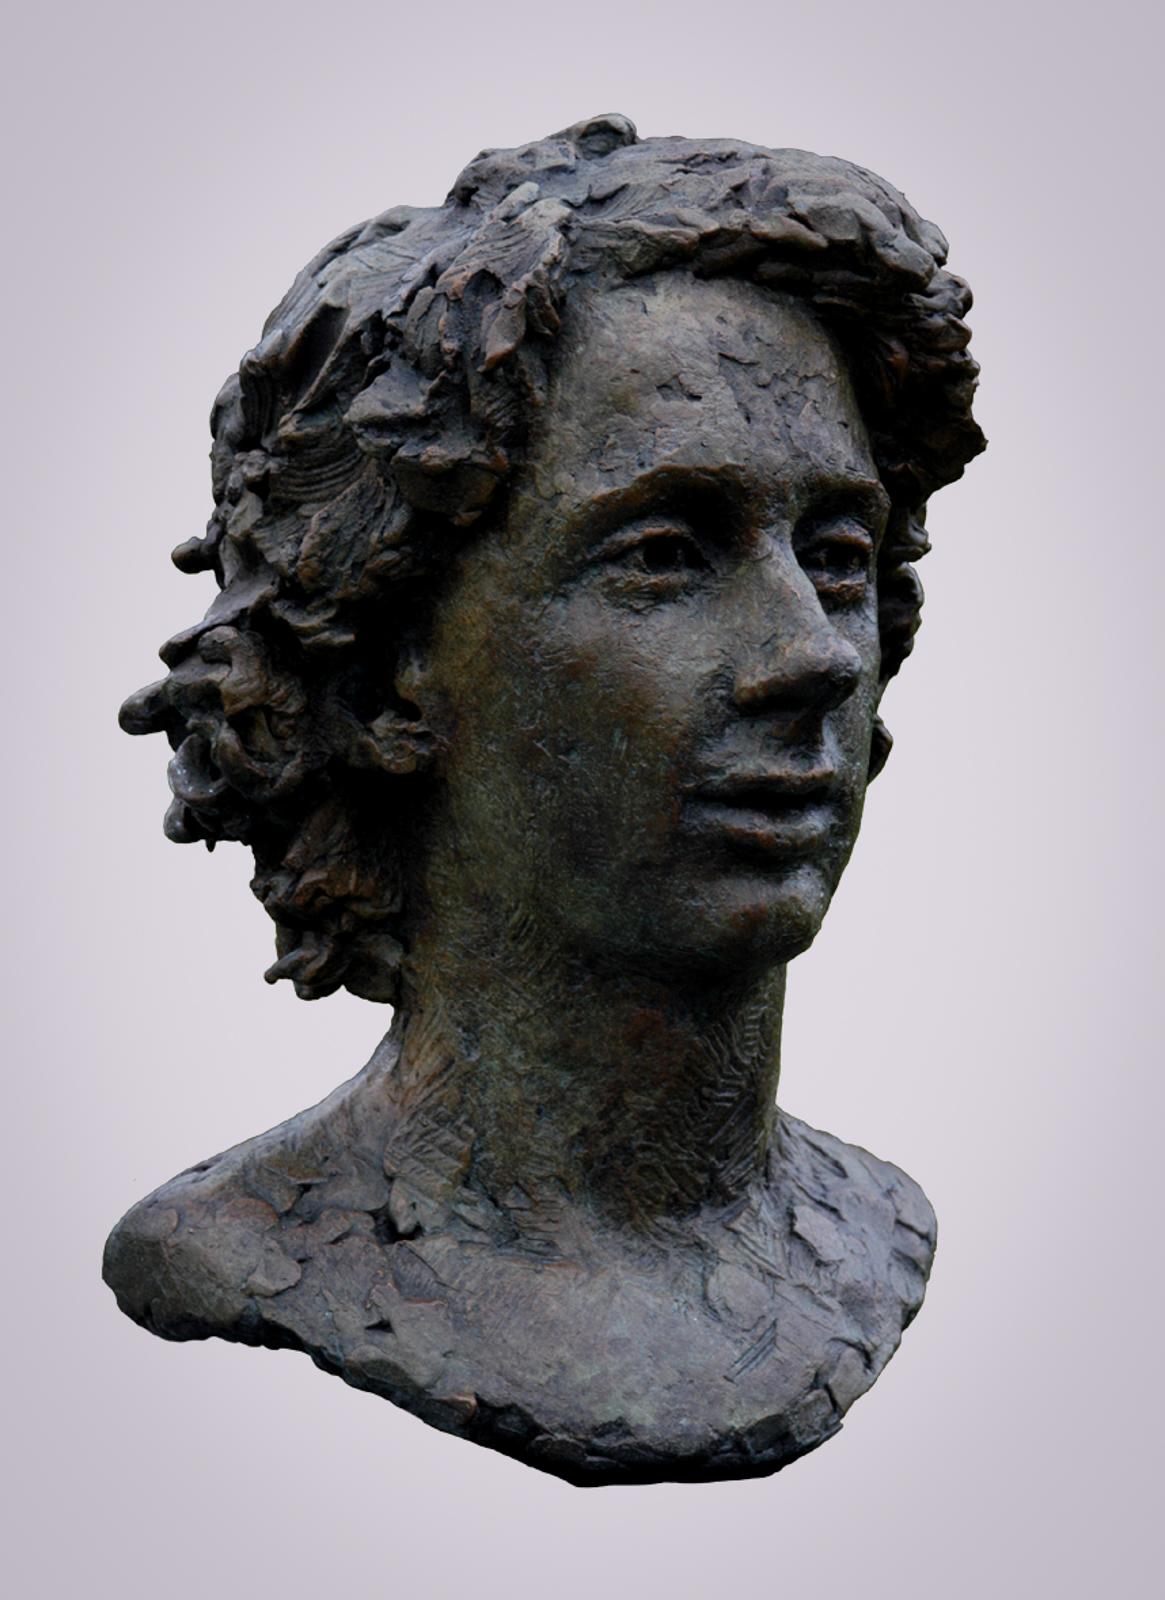 Rory Marsden 2002